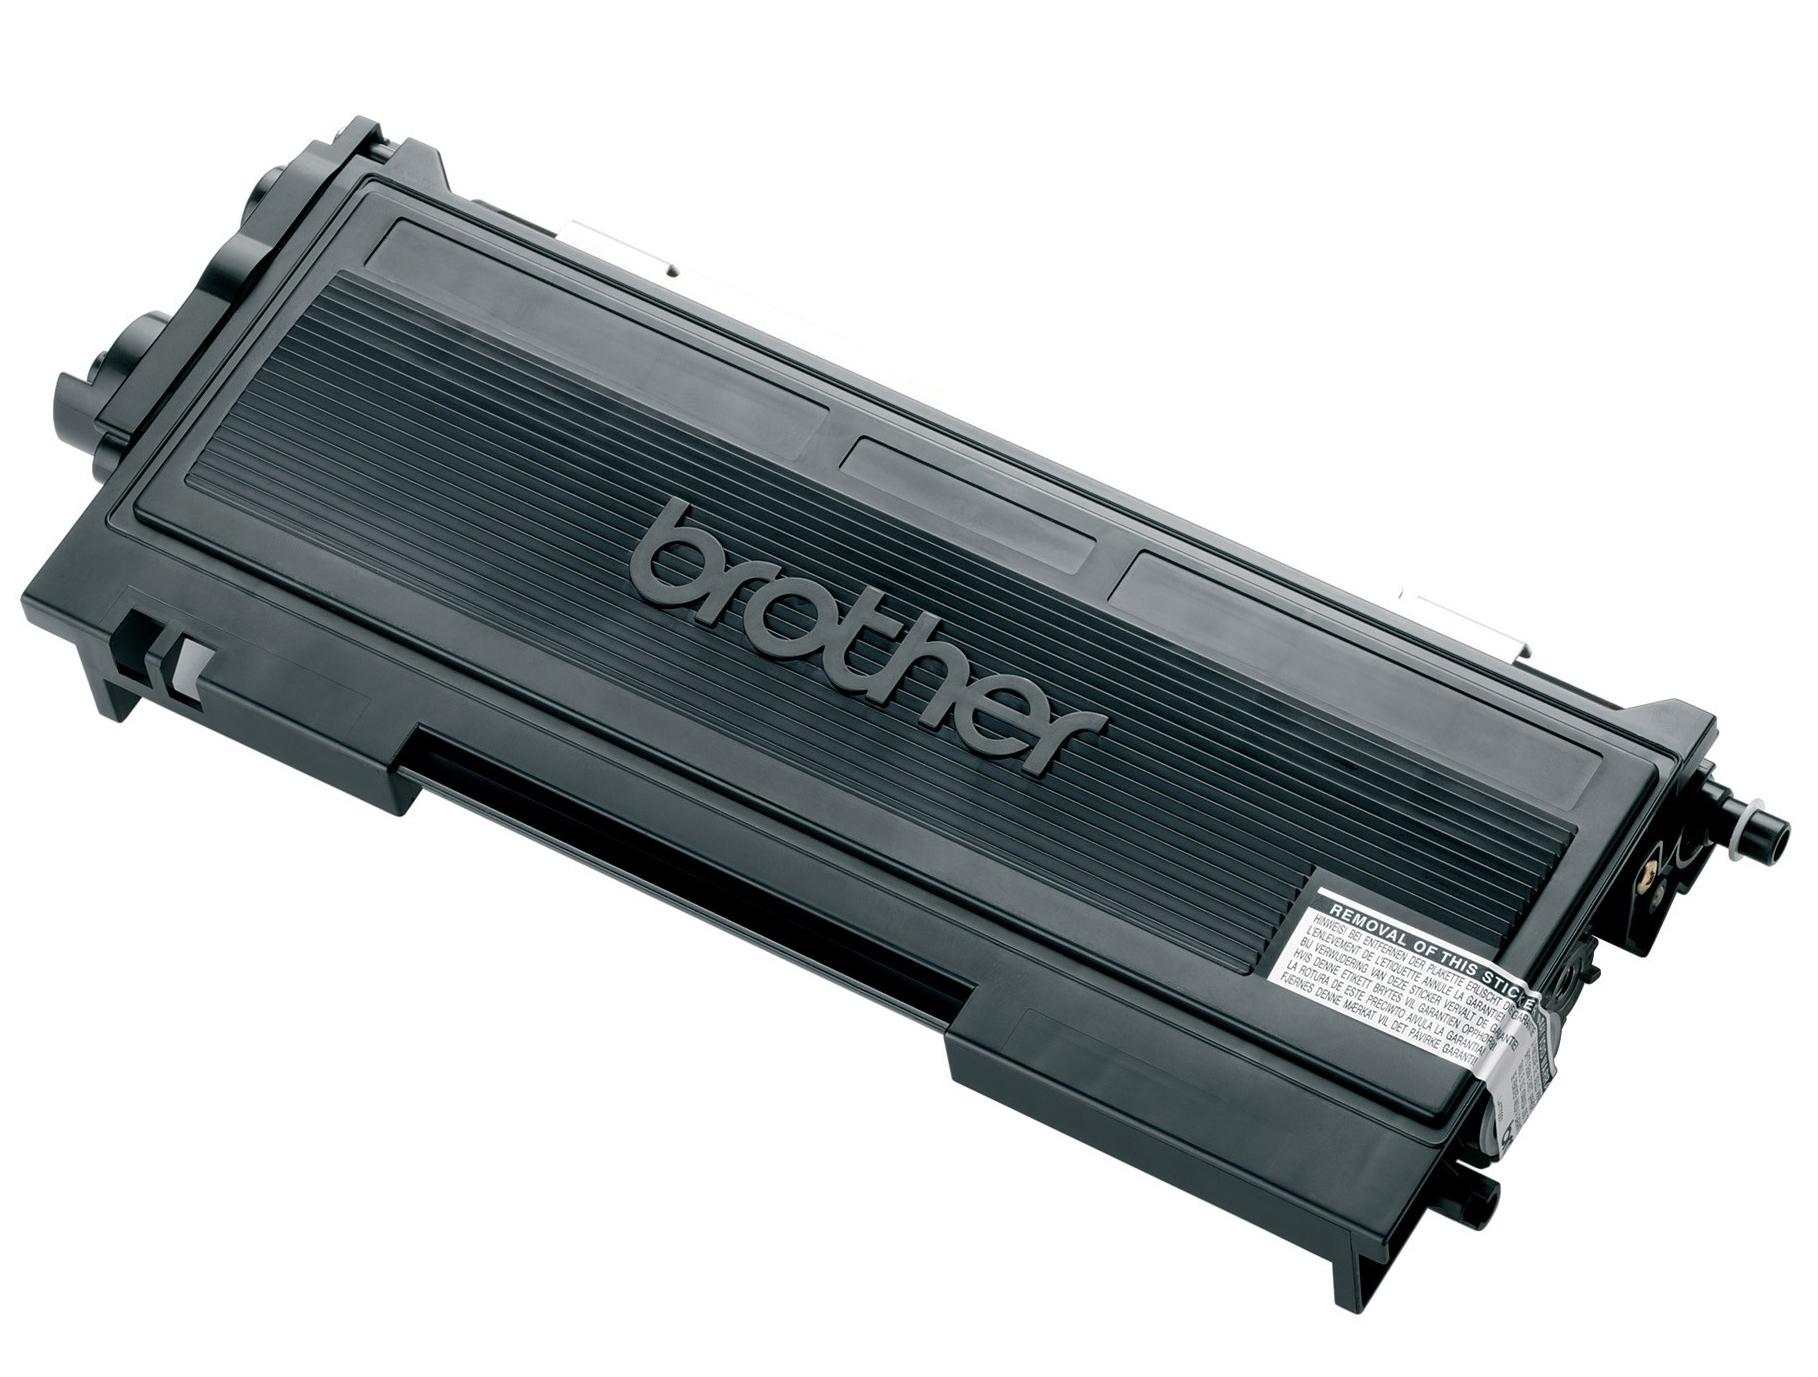 BROTHER TN2000 Toner fuer HL2030 2040 2070N DCP7010 7010L 7025 HL2070N Fax2820 MFC7420 7820N 7225N 2500prints